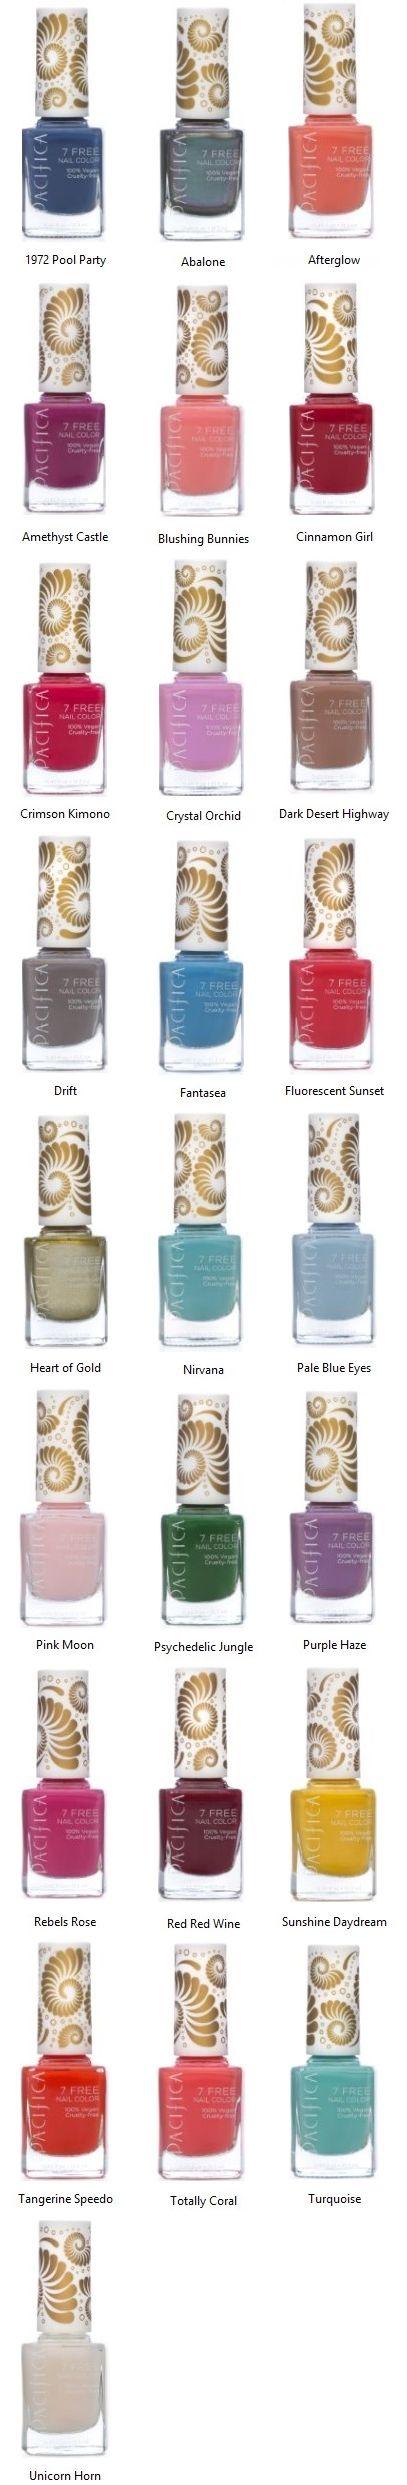 56 best Chemical free nail polish images on Pinterest | Nail polish ...